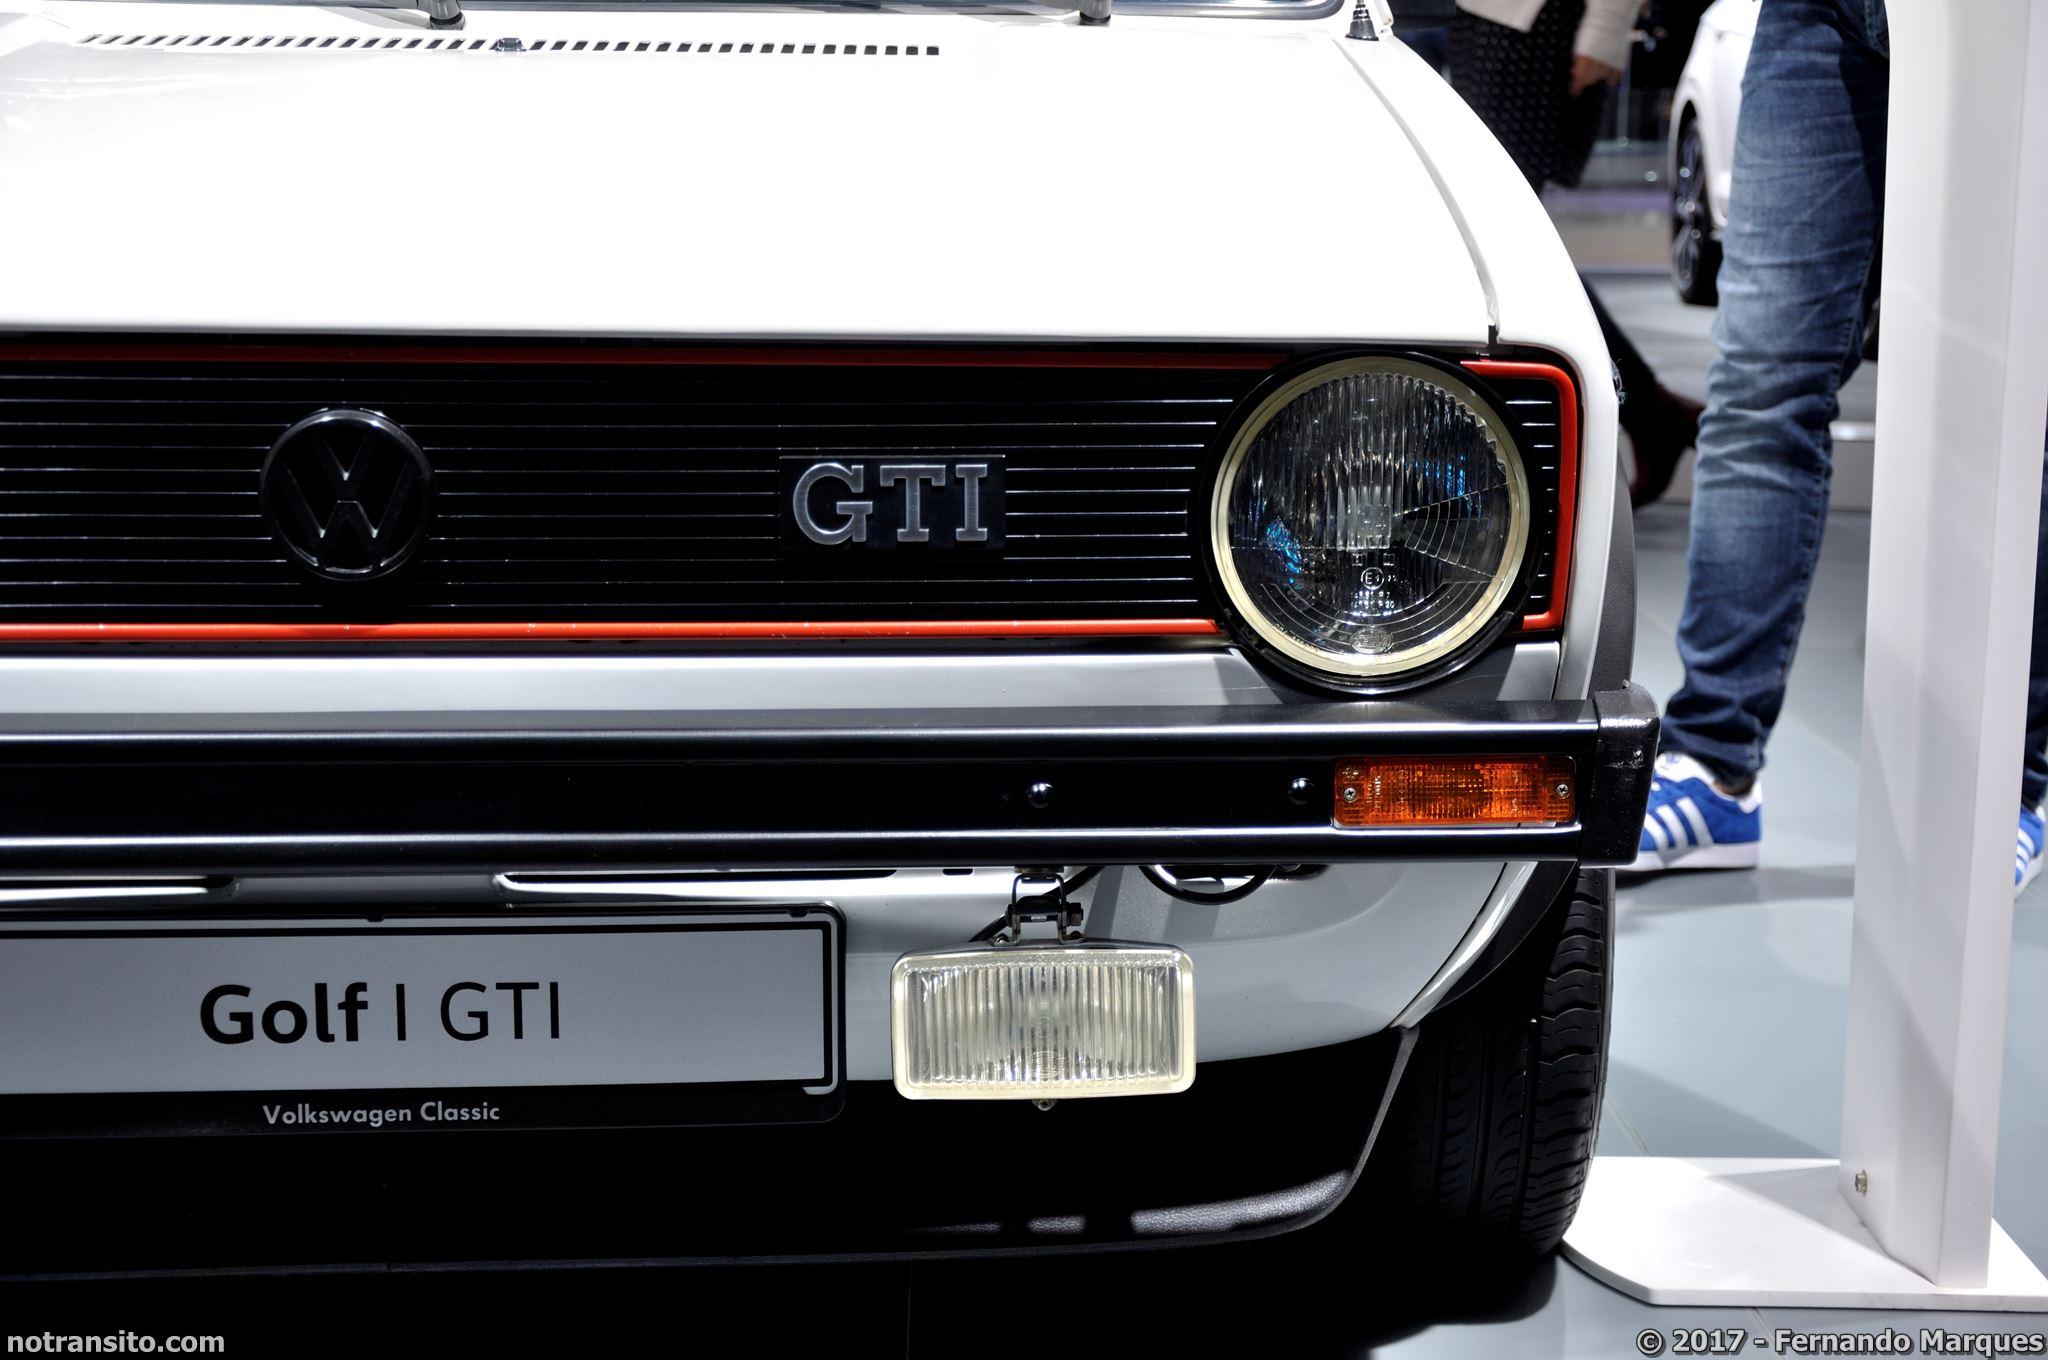 Volkswagen-Golf-GTI-Frankfurt-2017-002